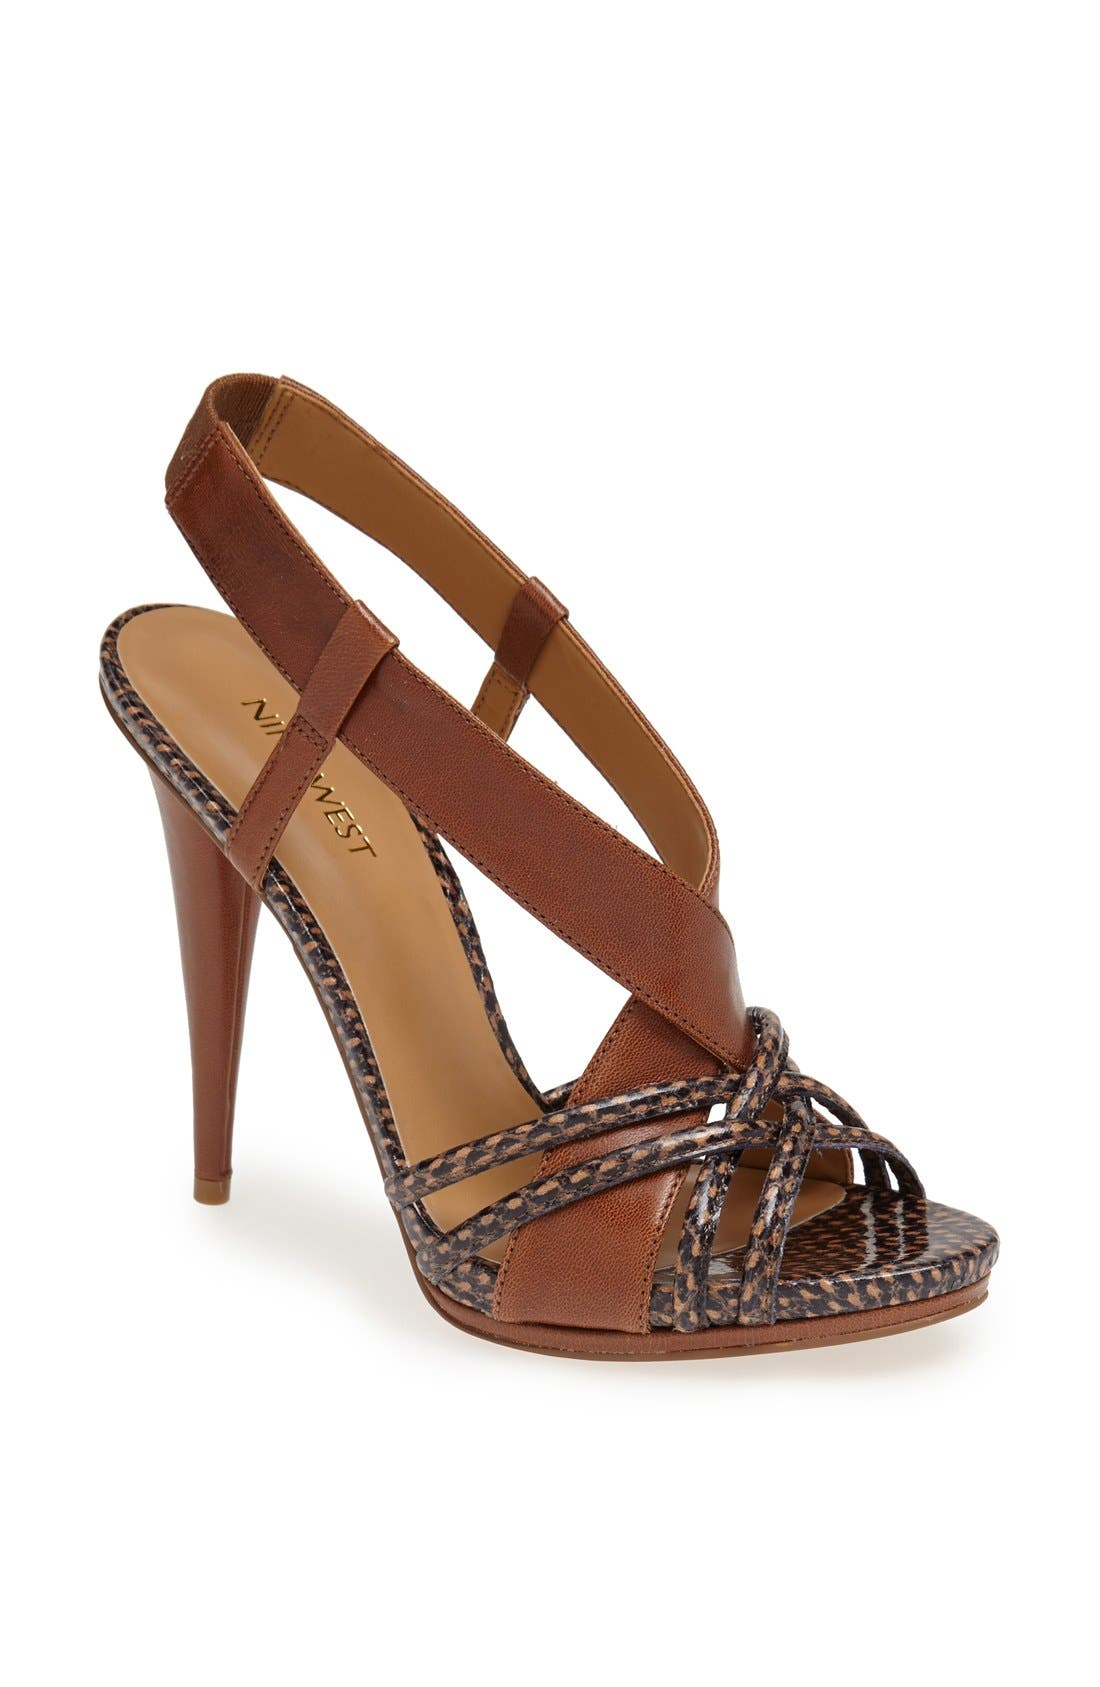 Main Image - Nine West 'Allysse' Leather Sandal